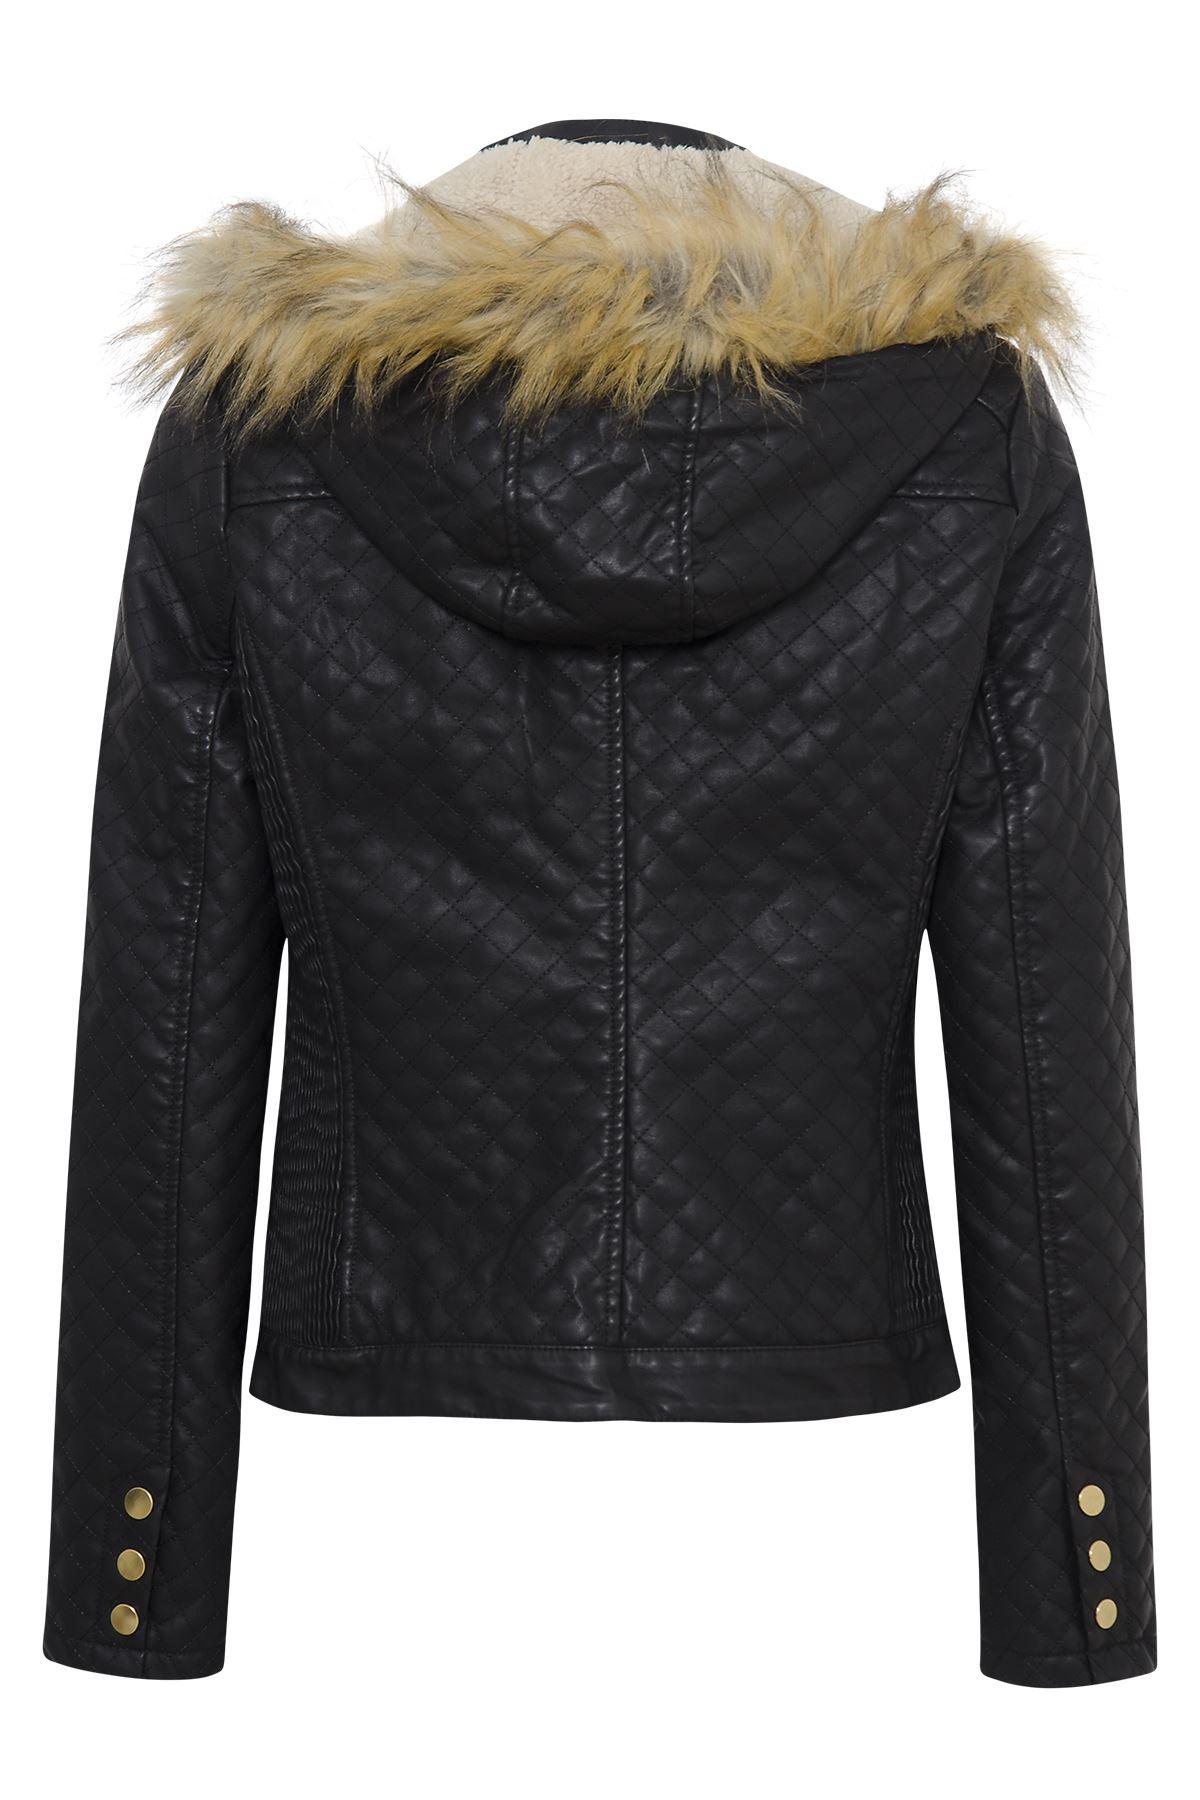 Womens Ladies Pu Faux Fur Quilted Hooded Fleece Pvc Leather Zip Biker Jacket Ebay